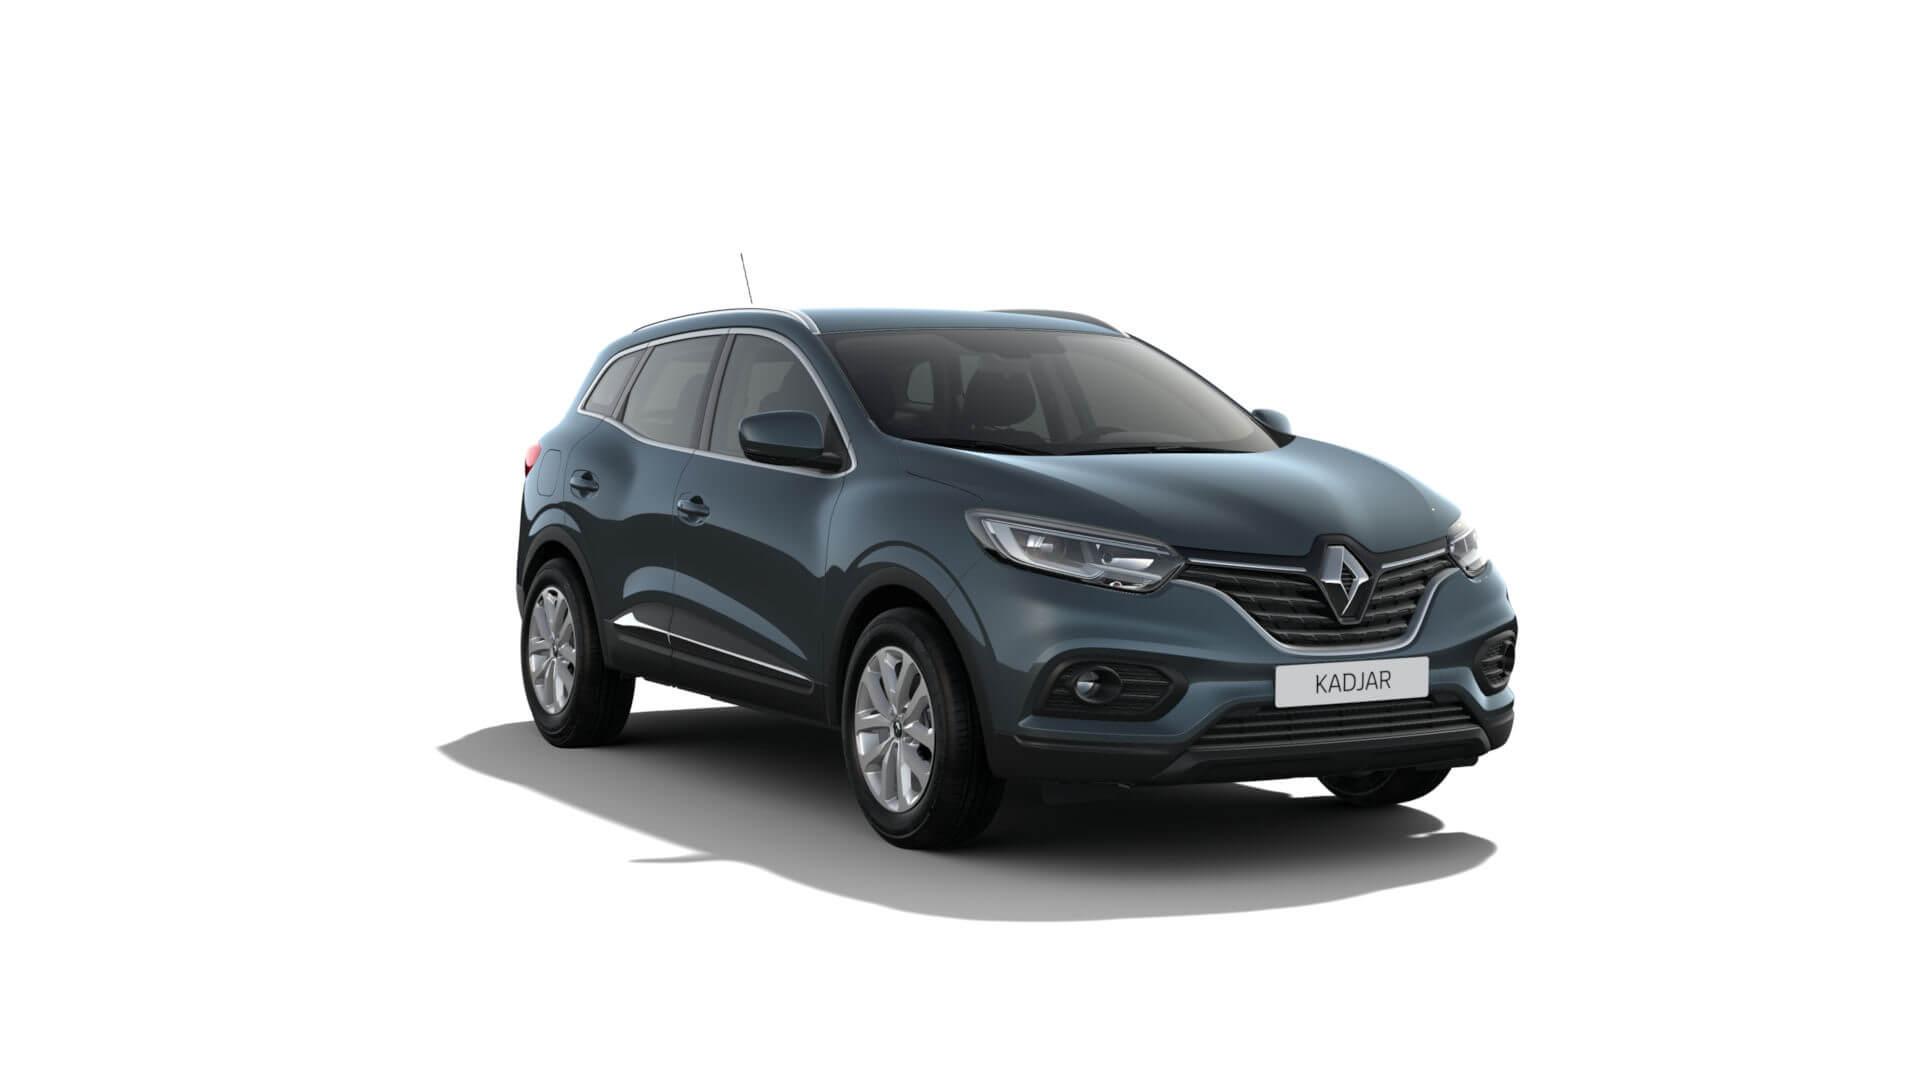 Automodell blaugrau - Renault Kadjar - Renault Ahrens Hannover